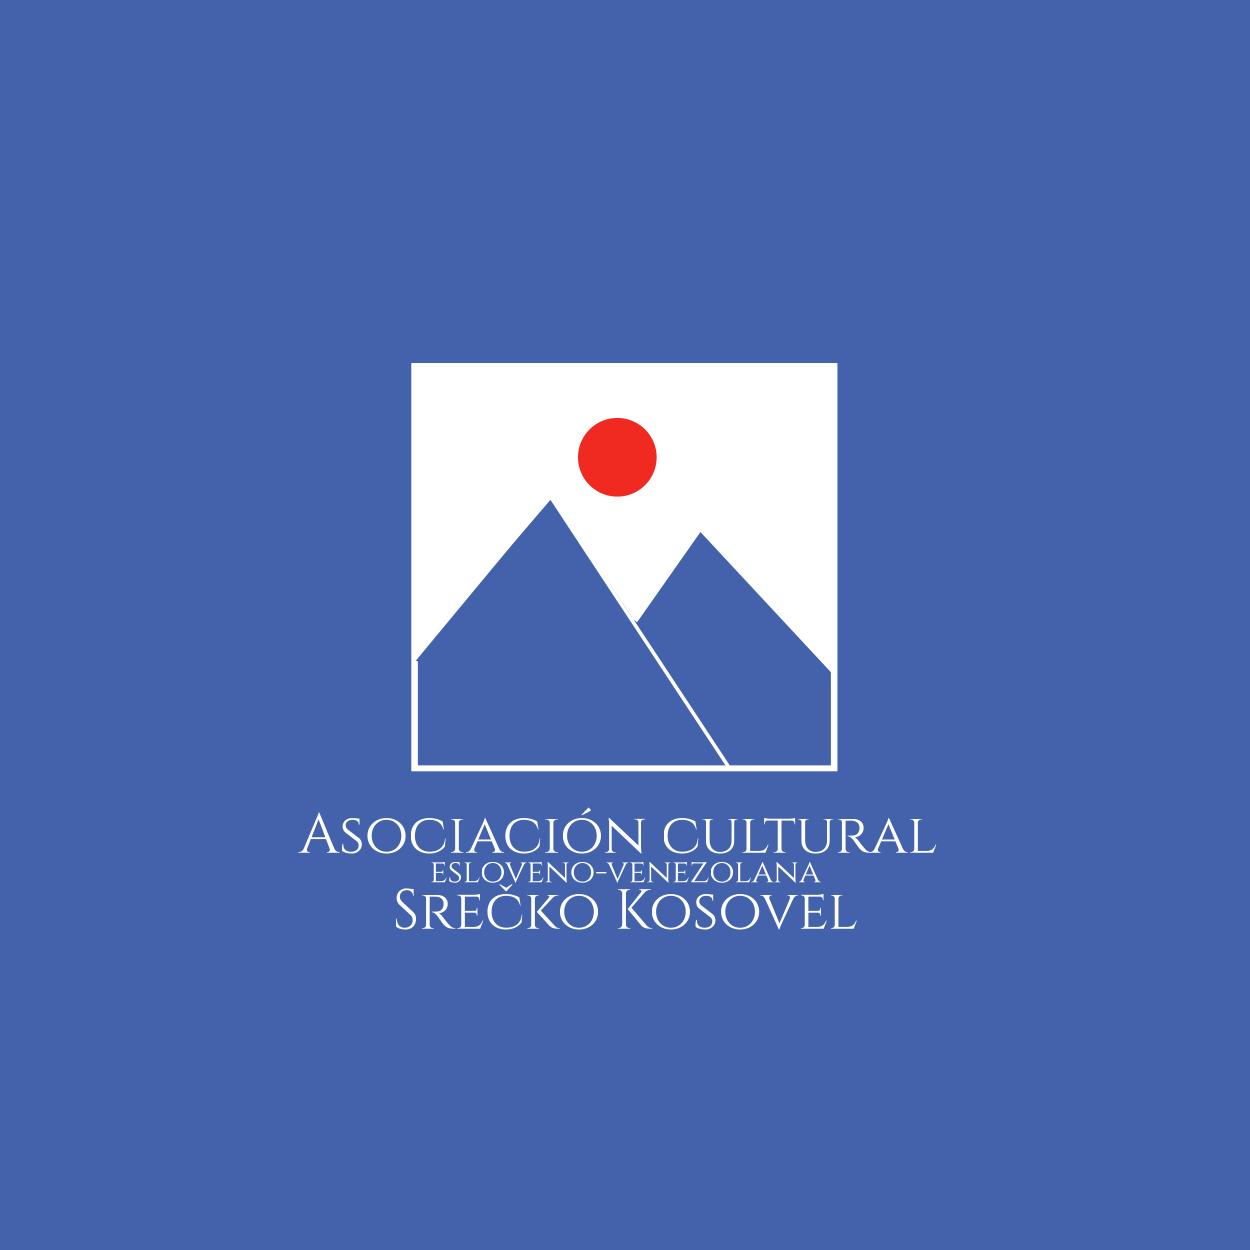 Asociación Cultural Esloveno-Venezolana Srečko Kosovel